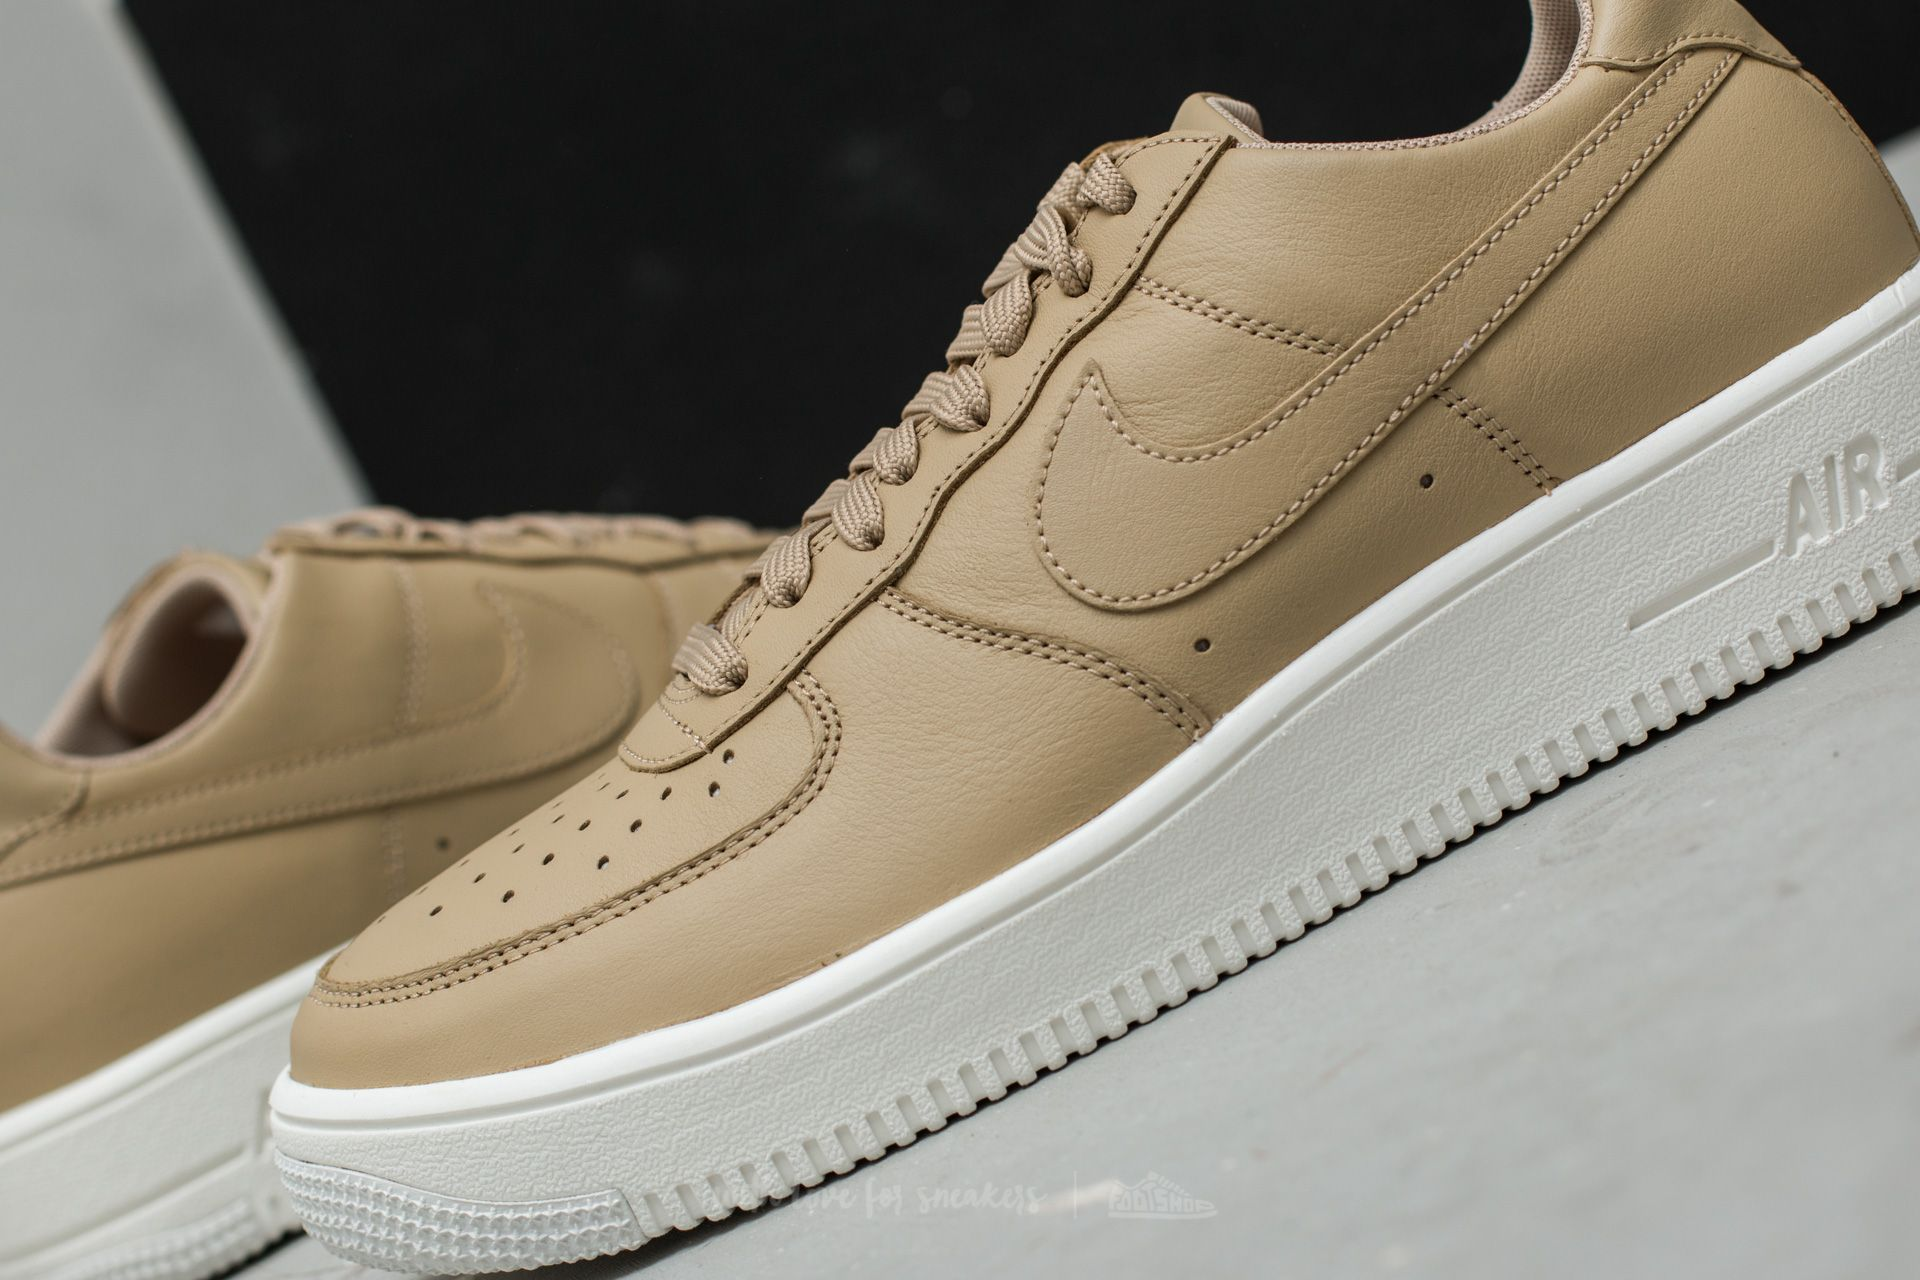 Nike Air Force 1 Ultraforce Leather MushroomSchwarzSummit